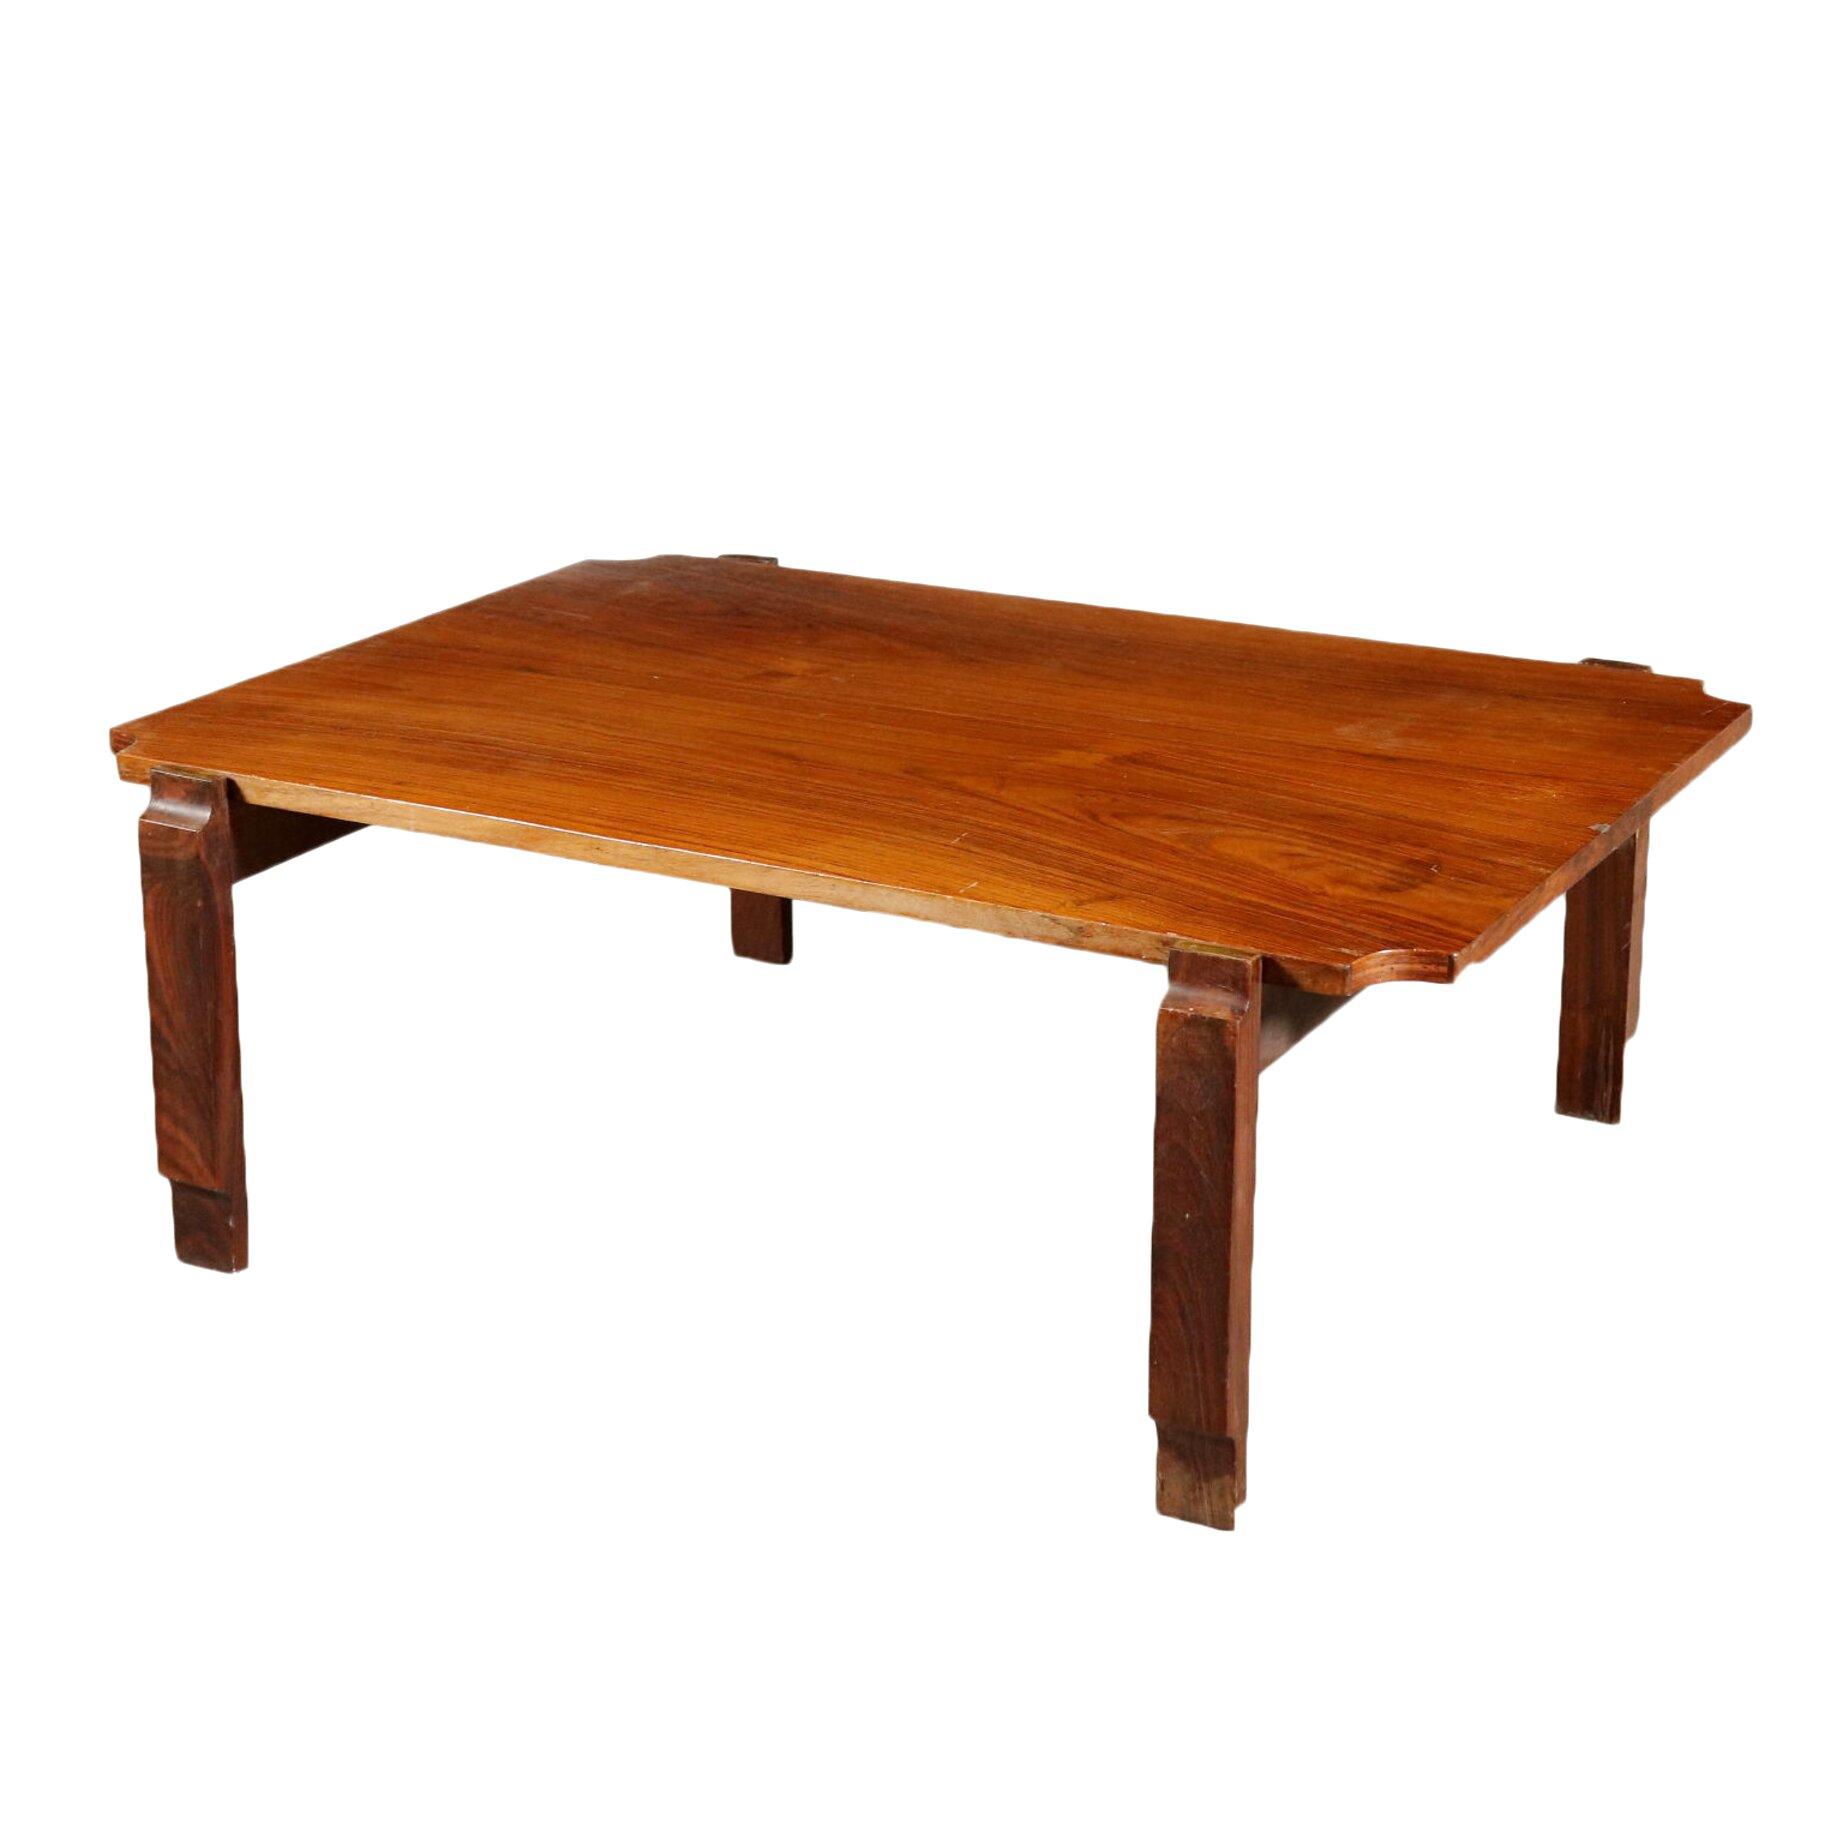 Ebay Tavolini Da Salotto Usati - Badezimmer Deko